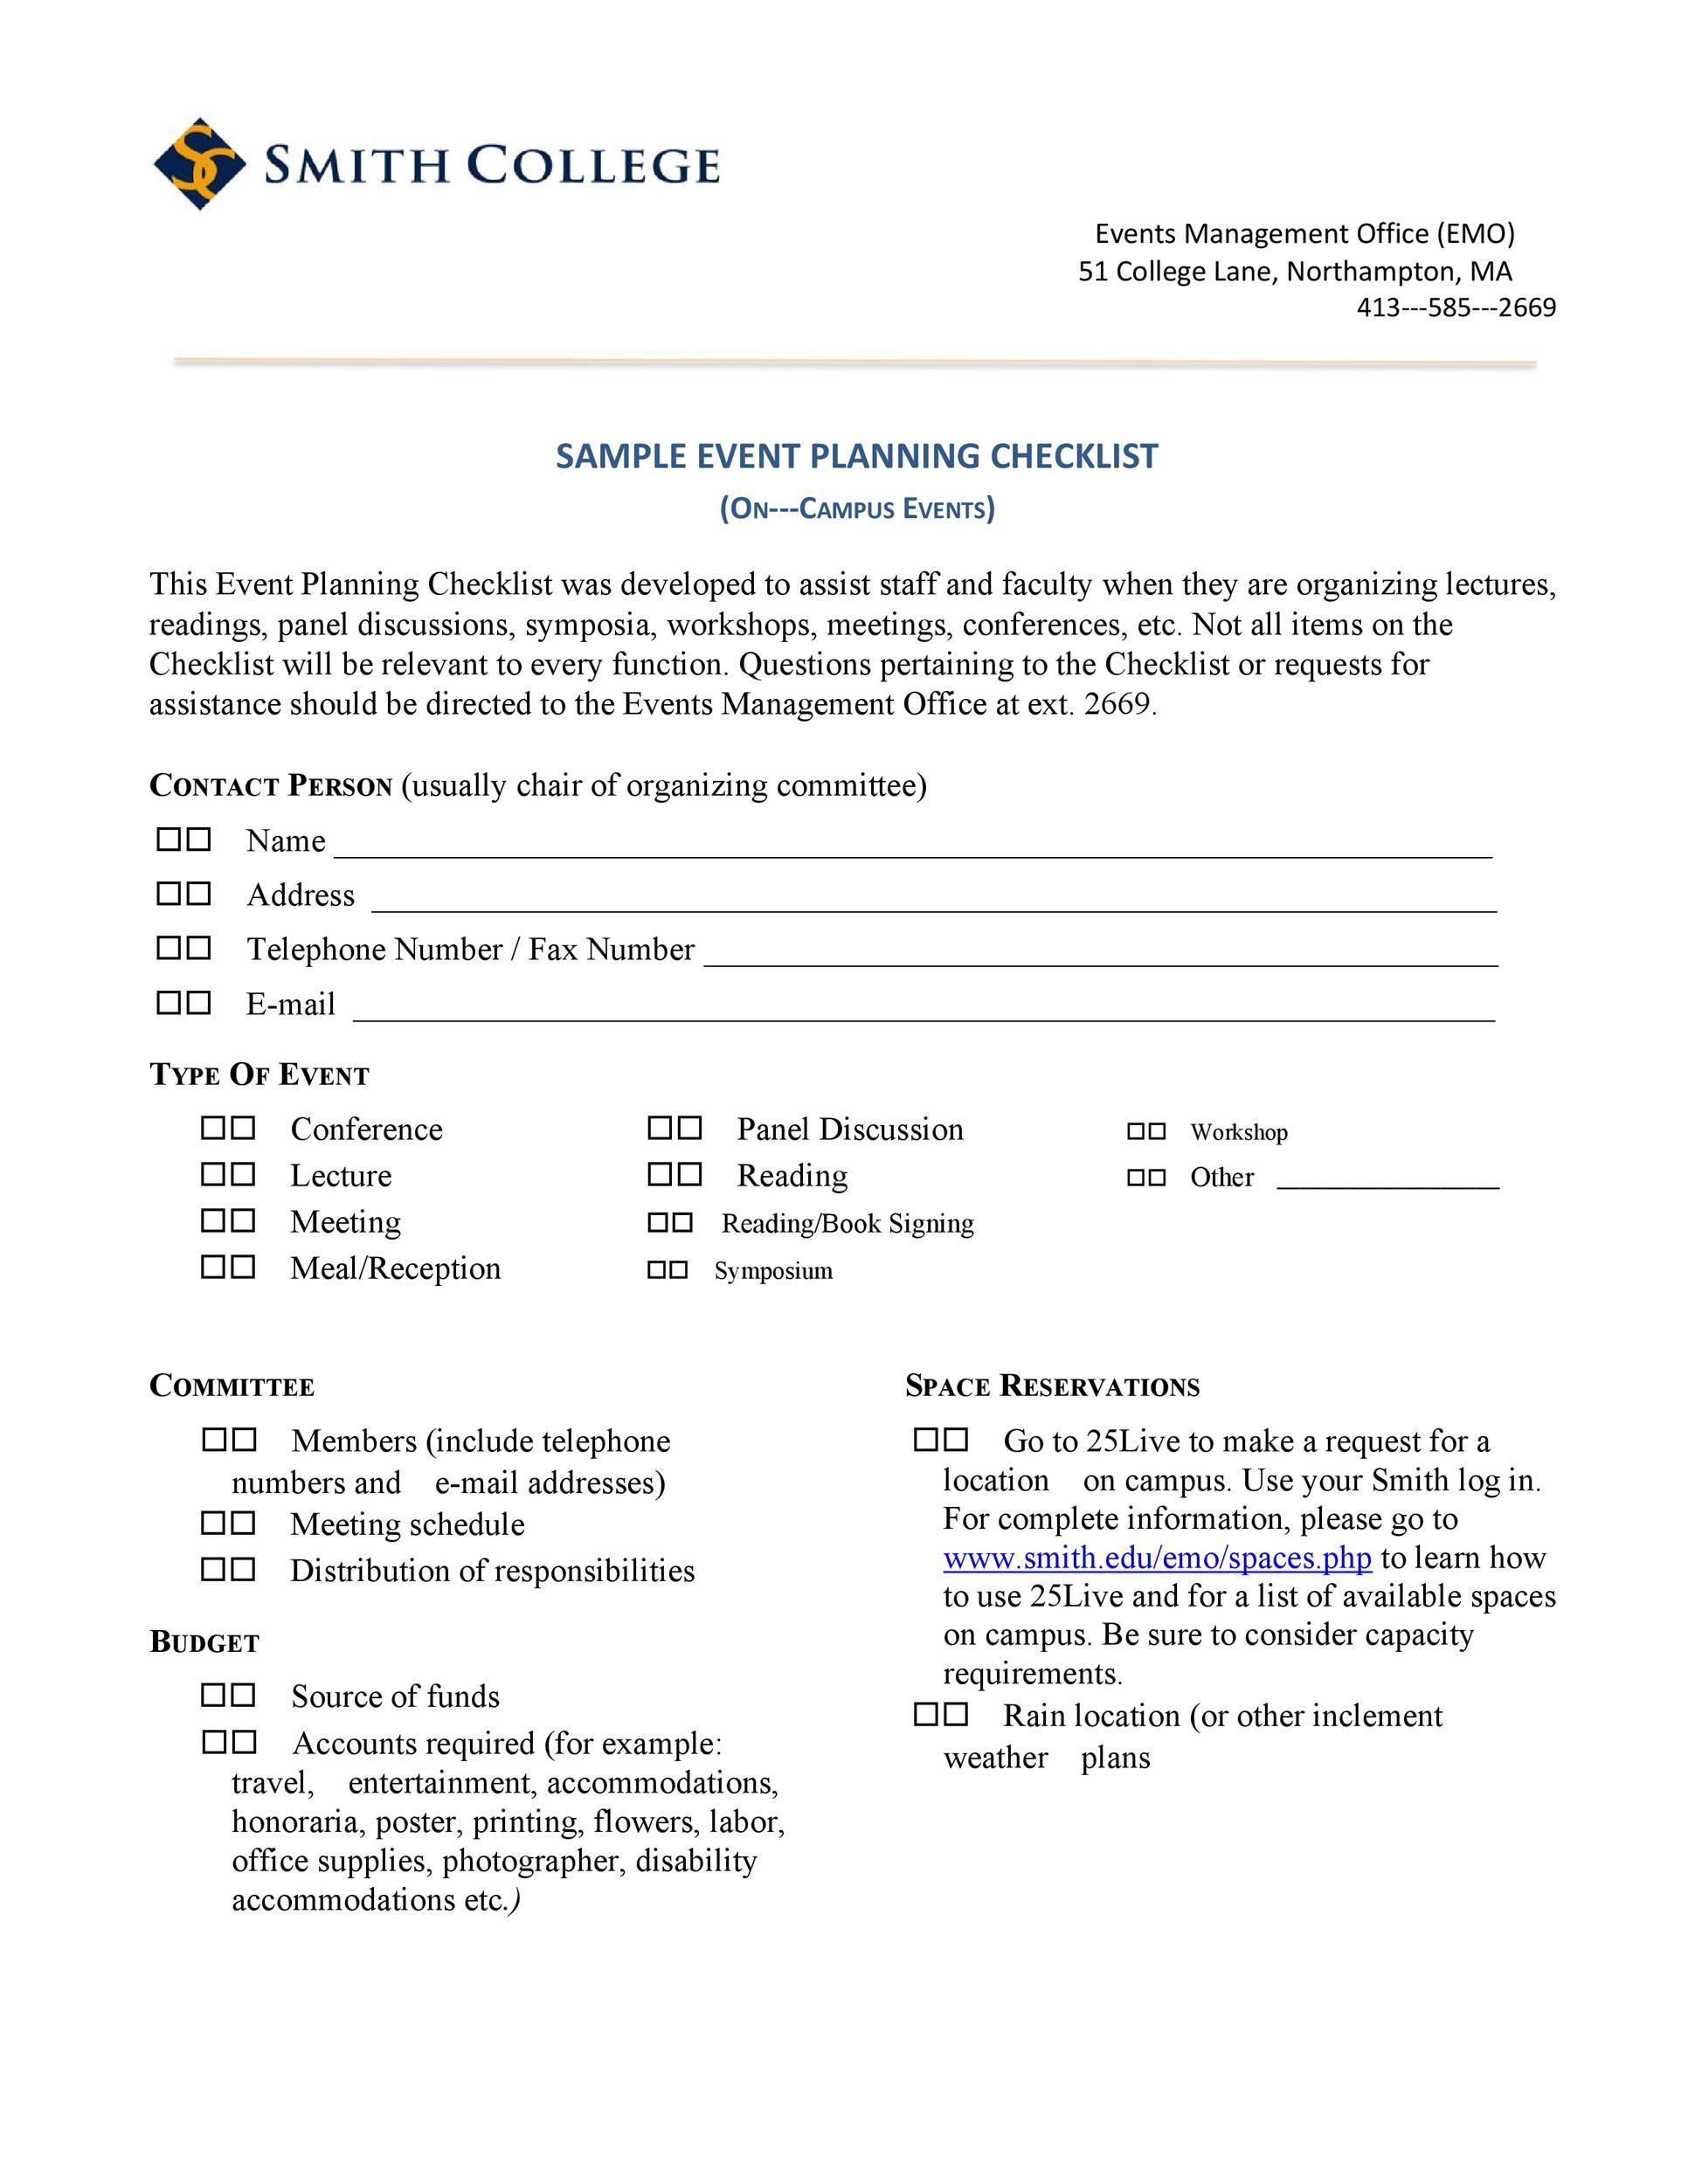 50 Professional Event Planning Checklist Templates